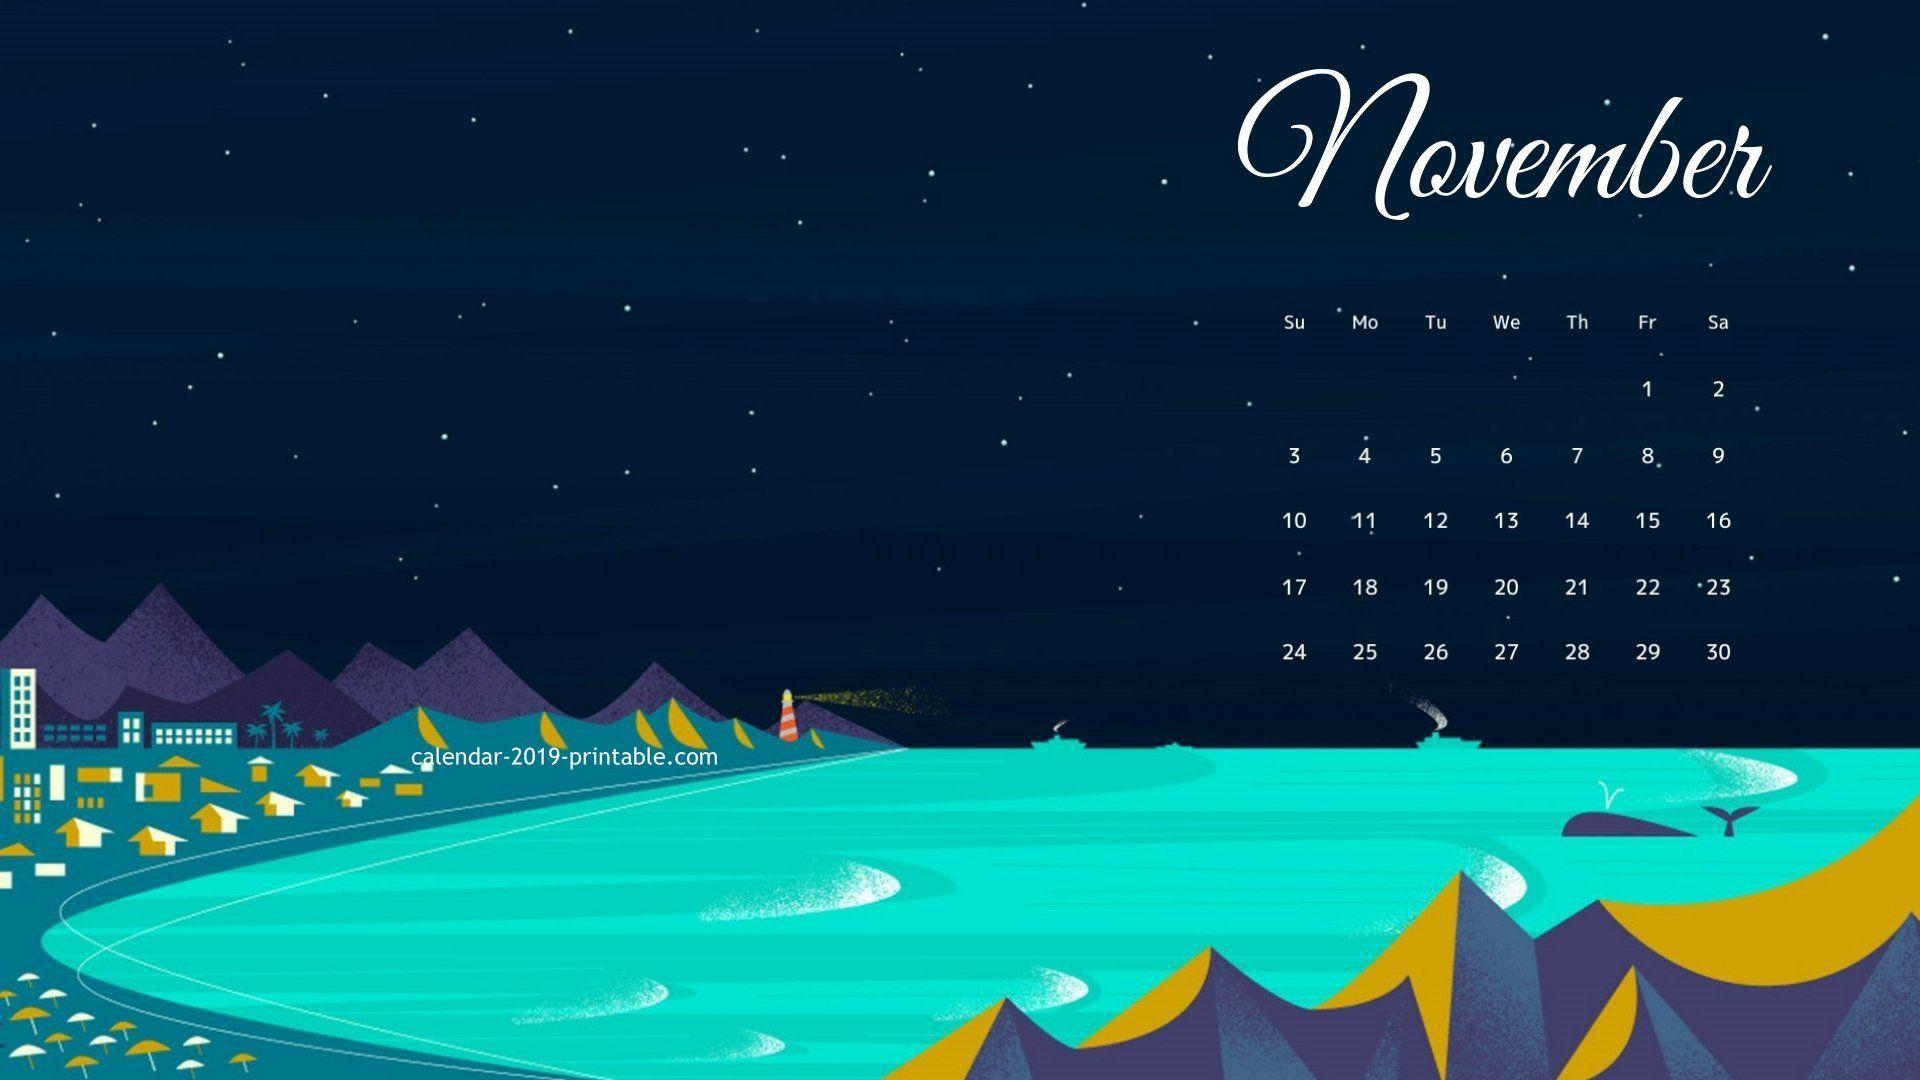 November 2019 Hd Wallpaper Calendar In 2019 2019 Calendar